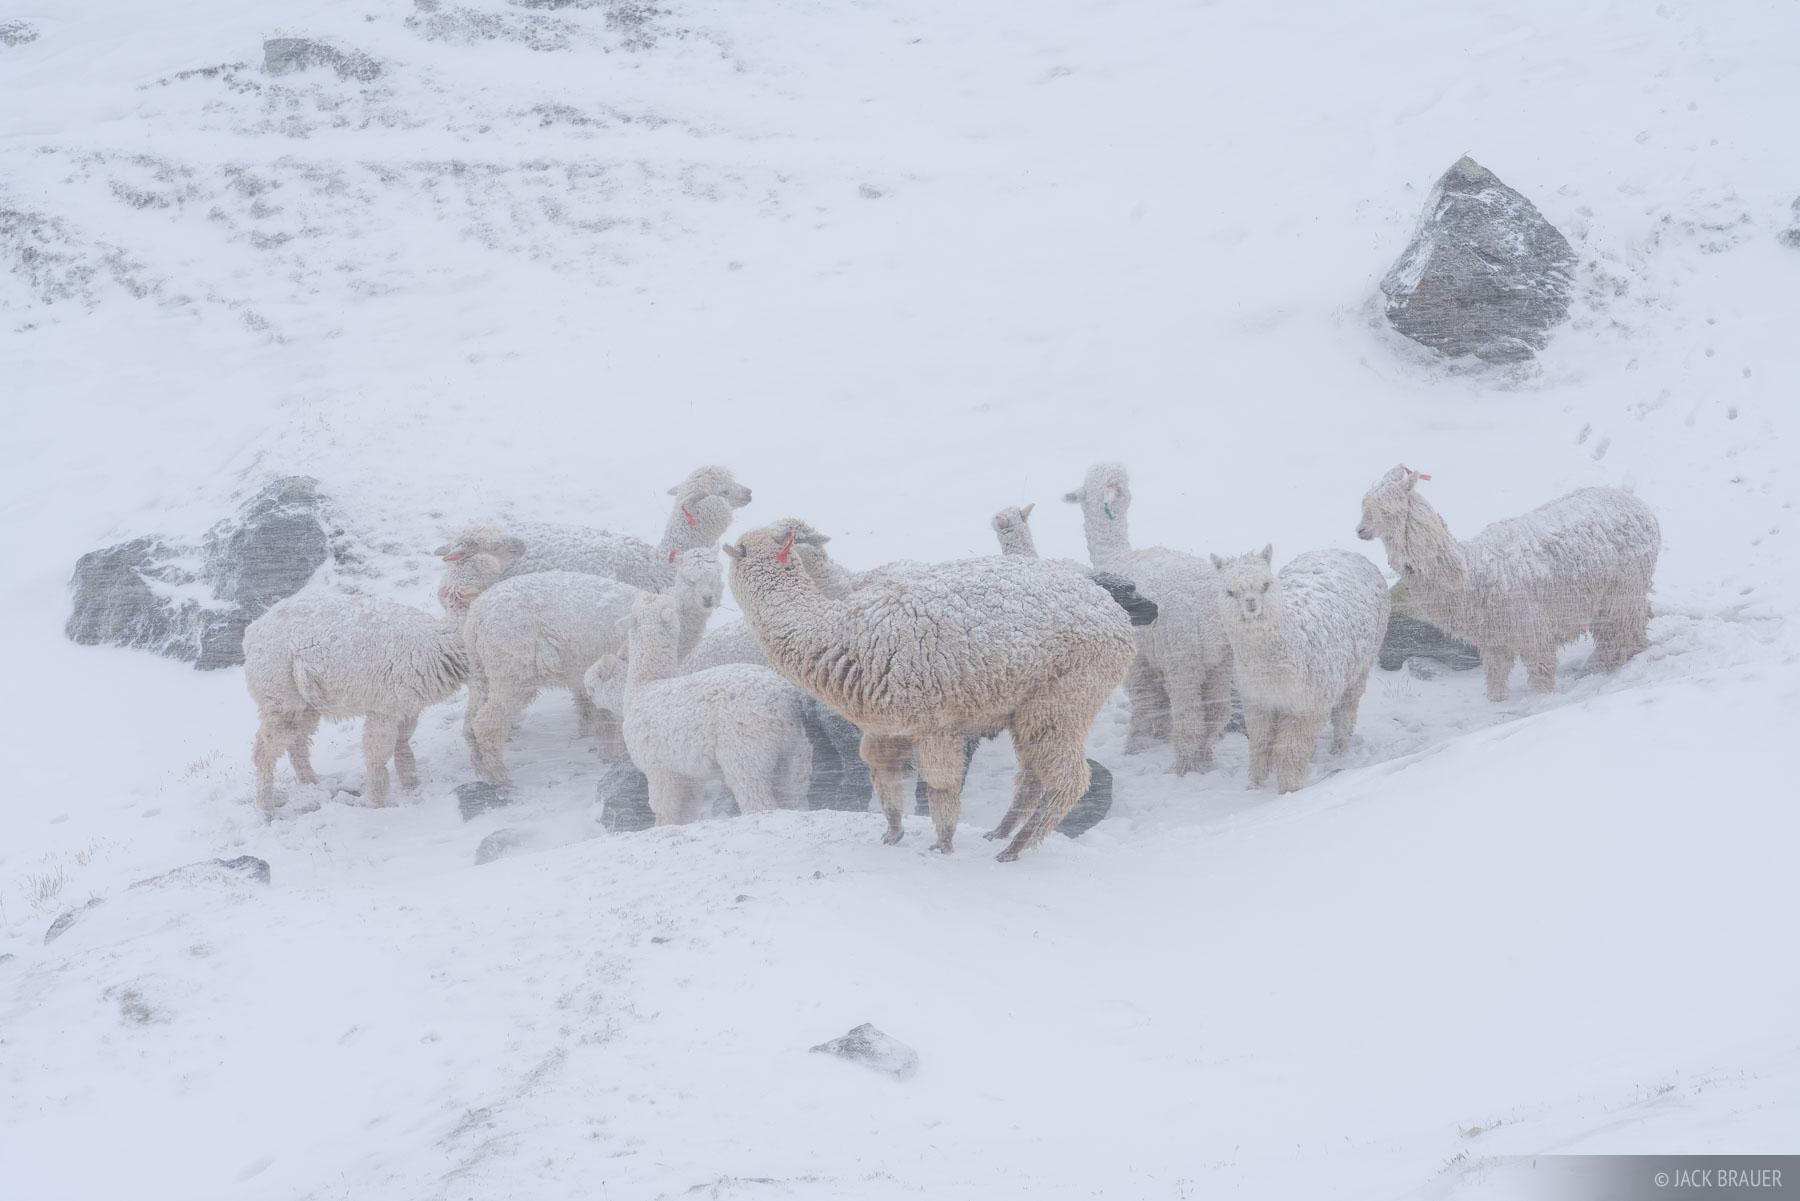 Abra Apacheta, Ausangate, Cordillera Vilcanota, Peru, South America, alpaca, photo